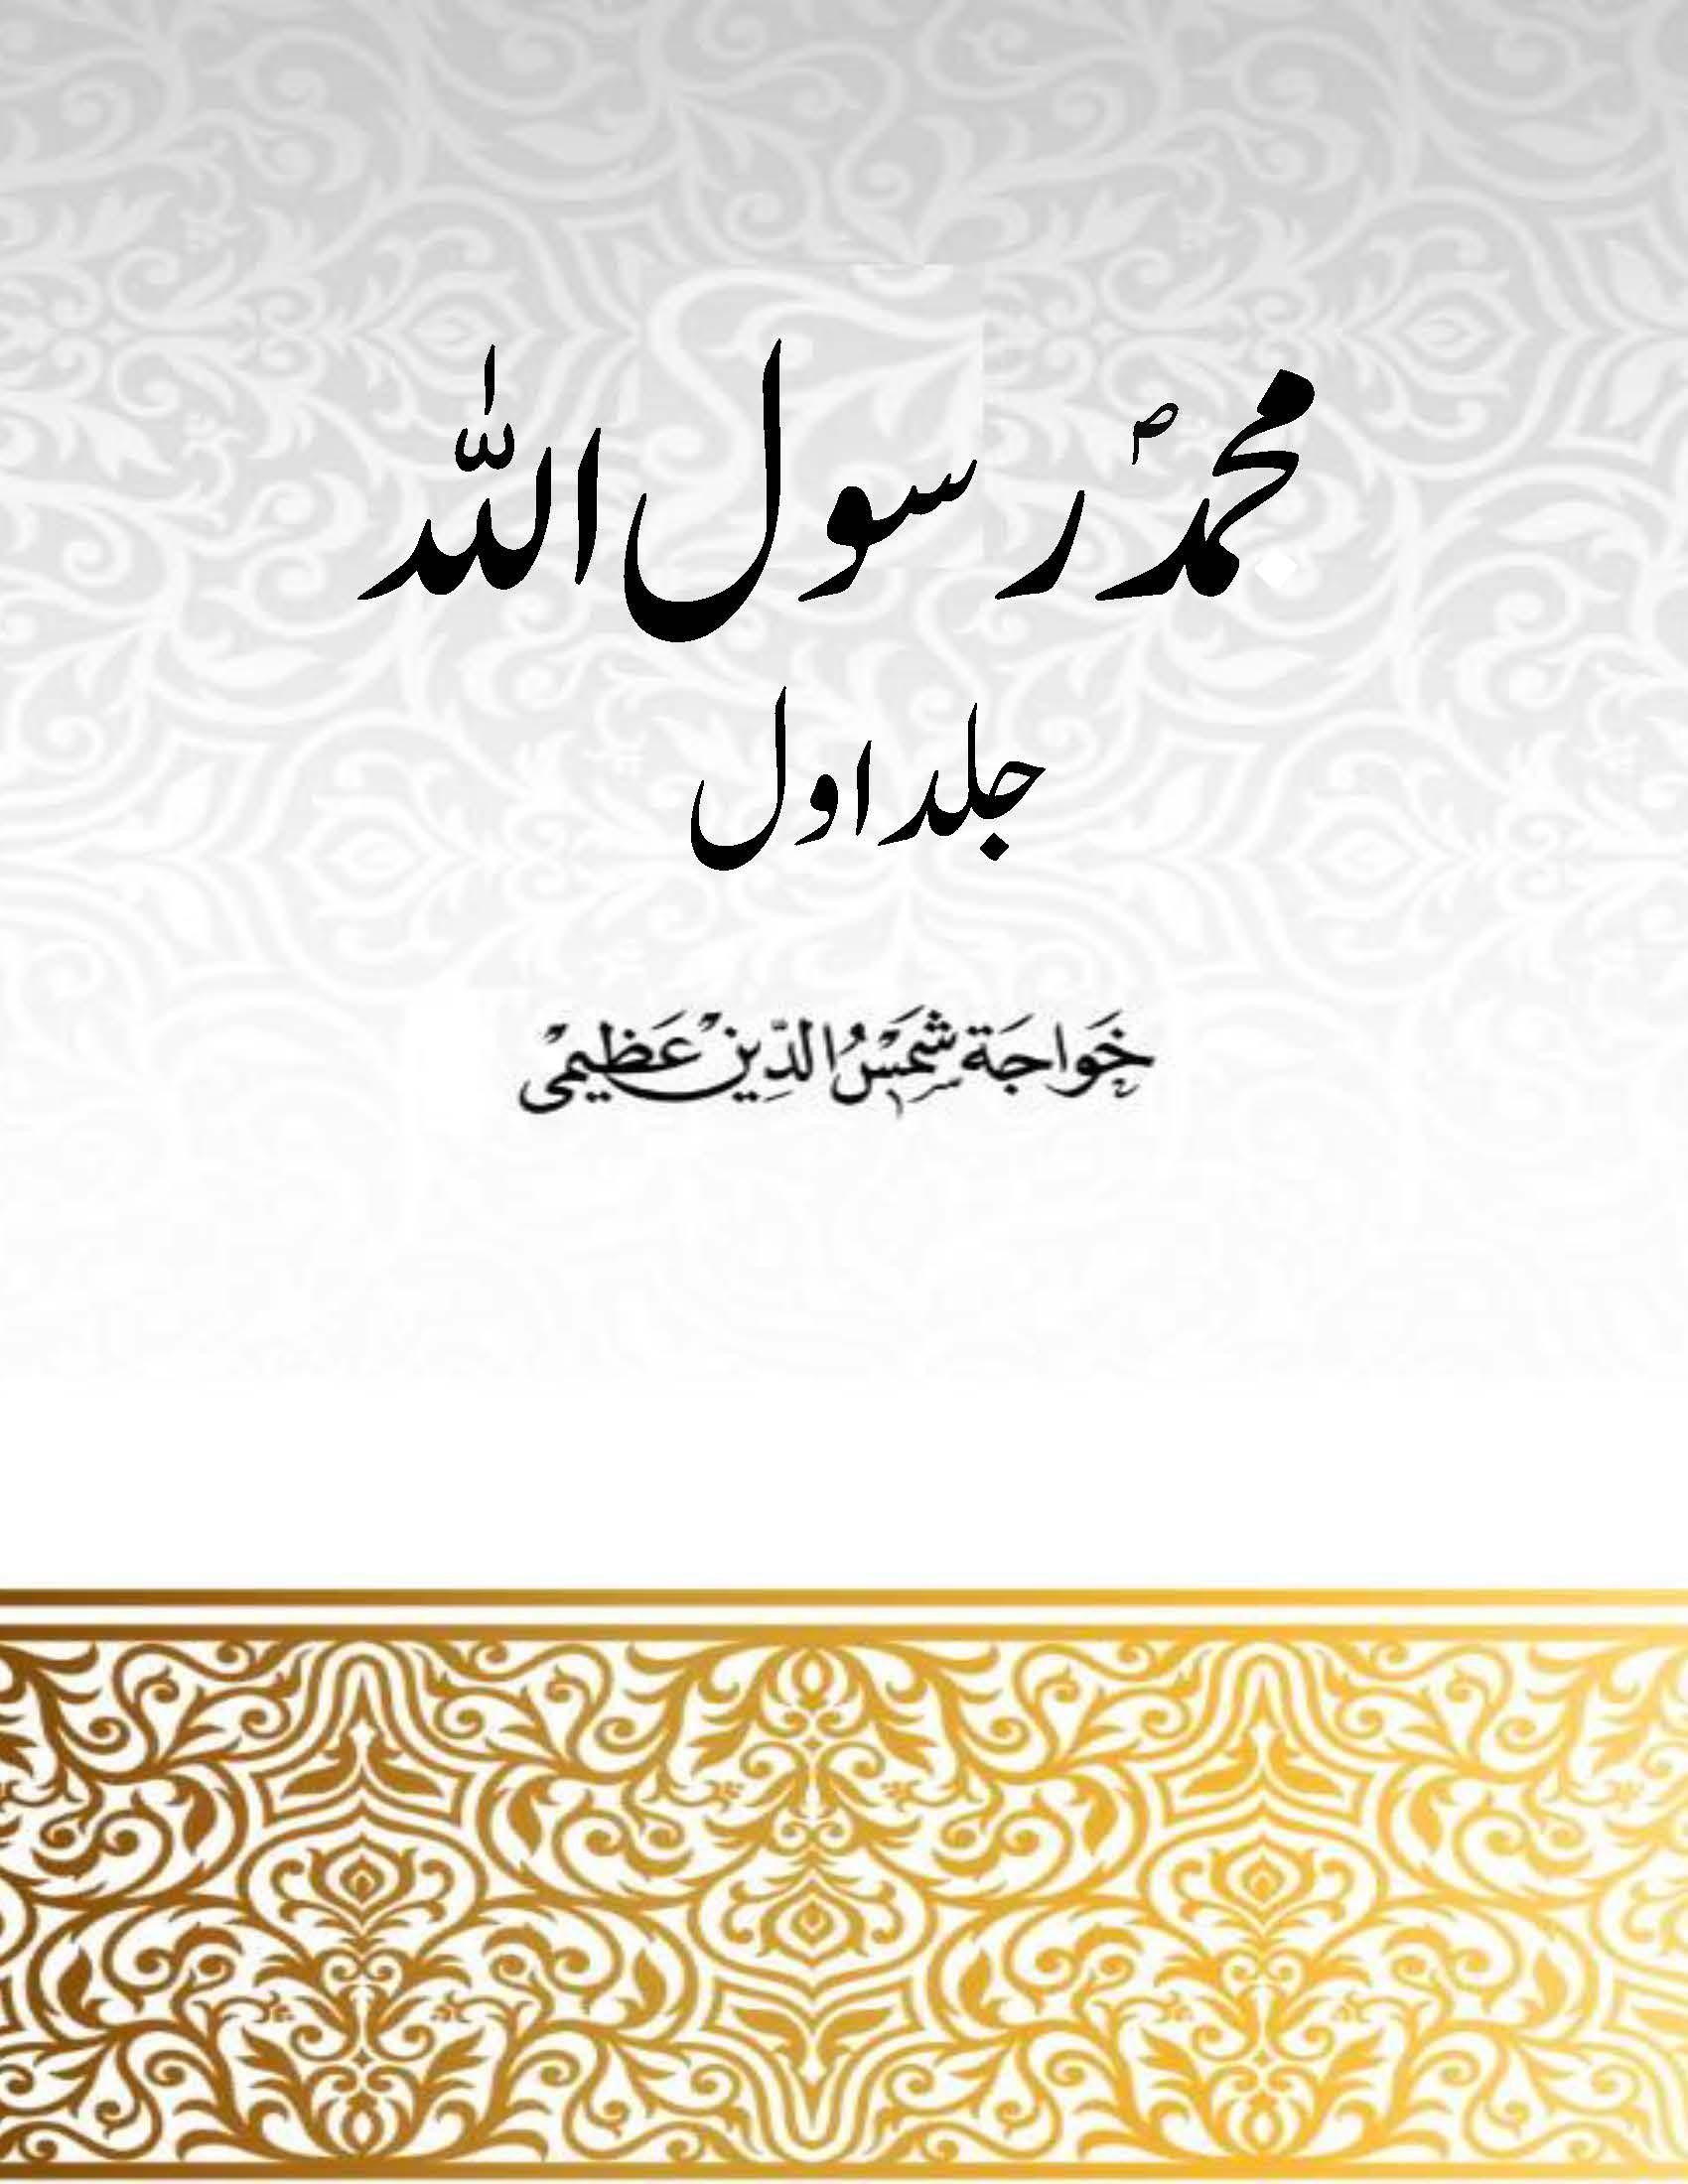 Mohammad Rasool Allah (1)